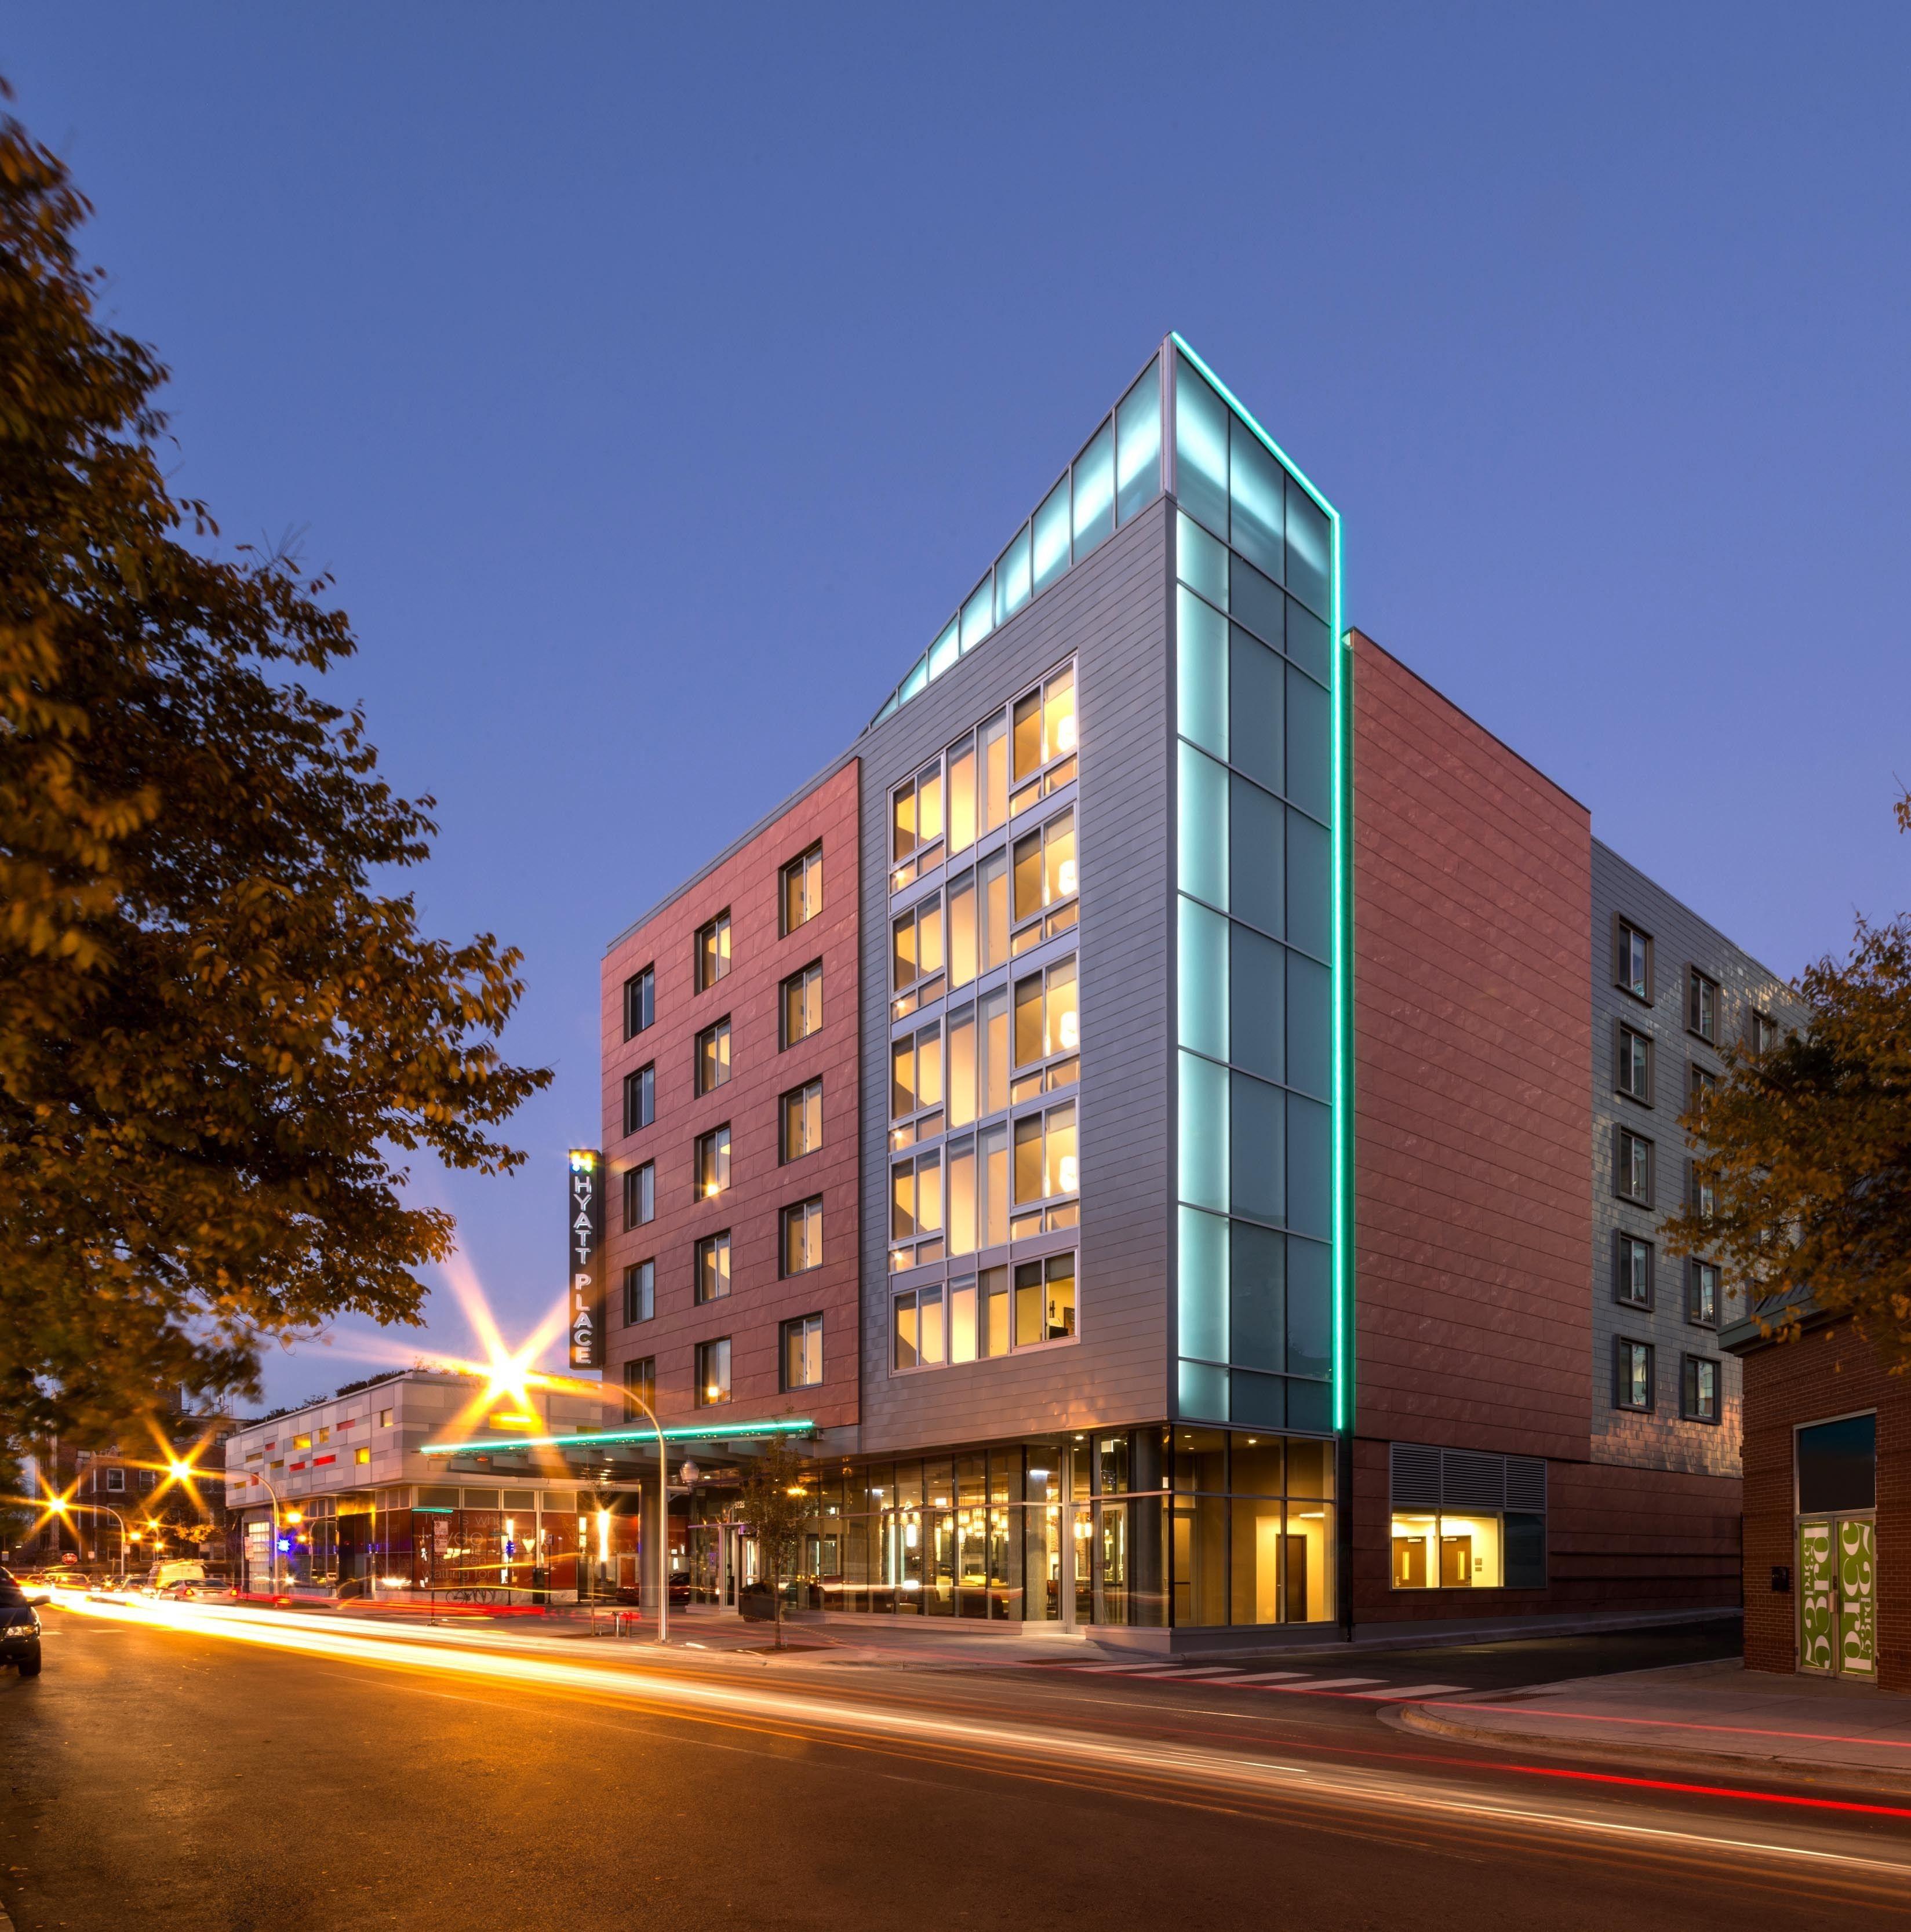 Hyatt Place South/university Medical Center